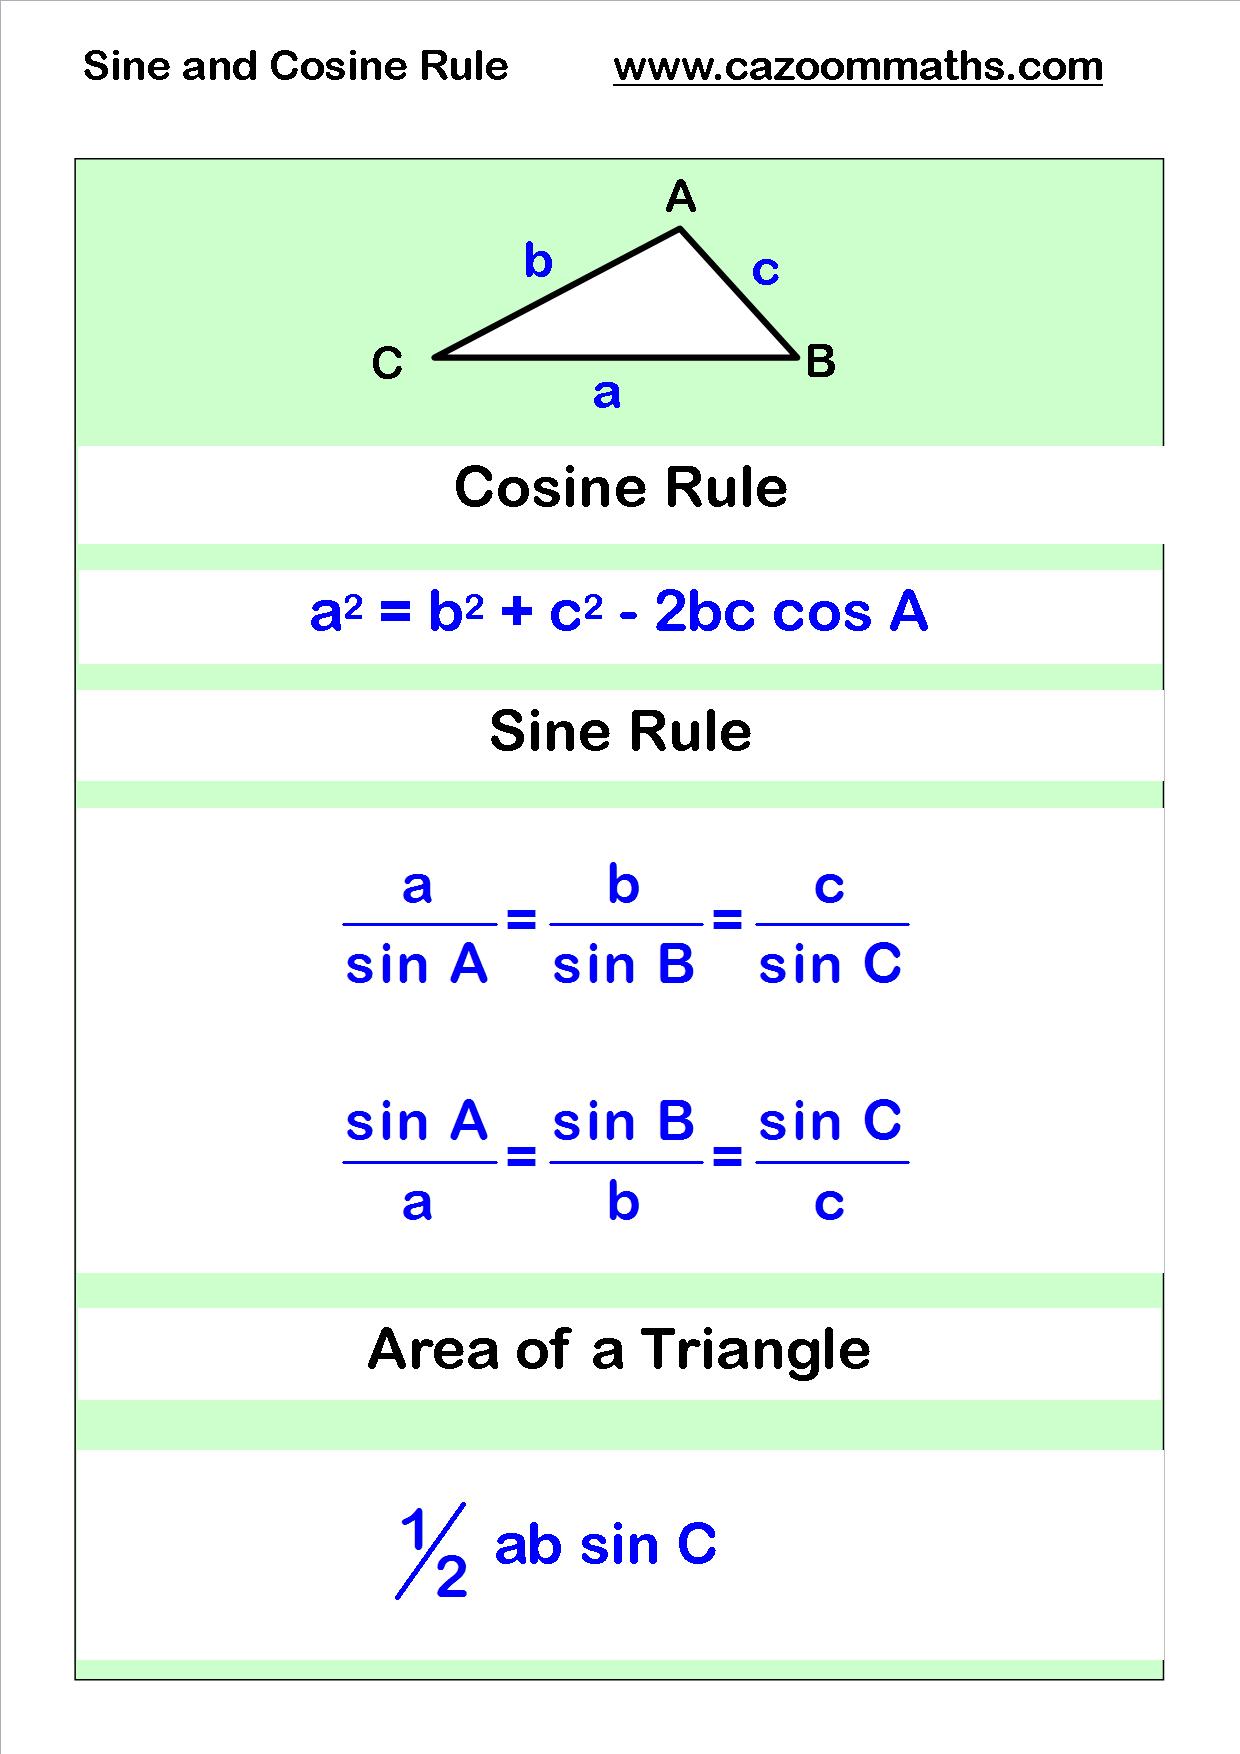 worksheet Sat Worksheets cosine and sine rule sat math pinterest geometry worksheets worksheetsmath worksheetssat